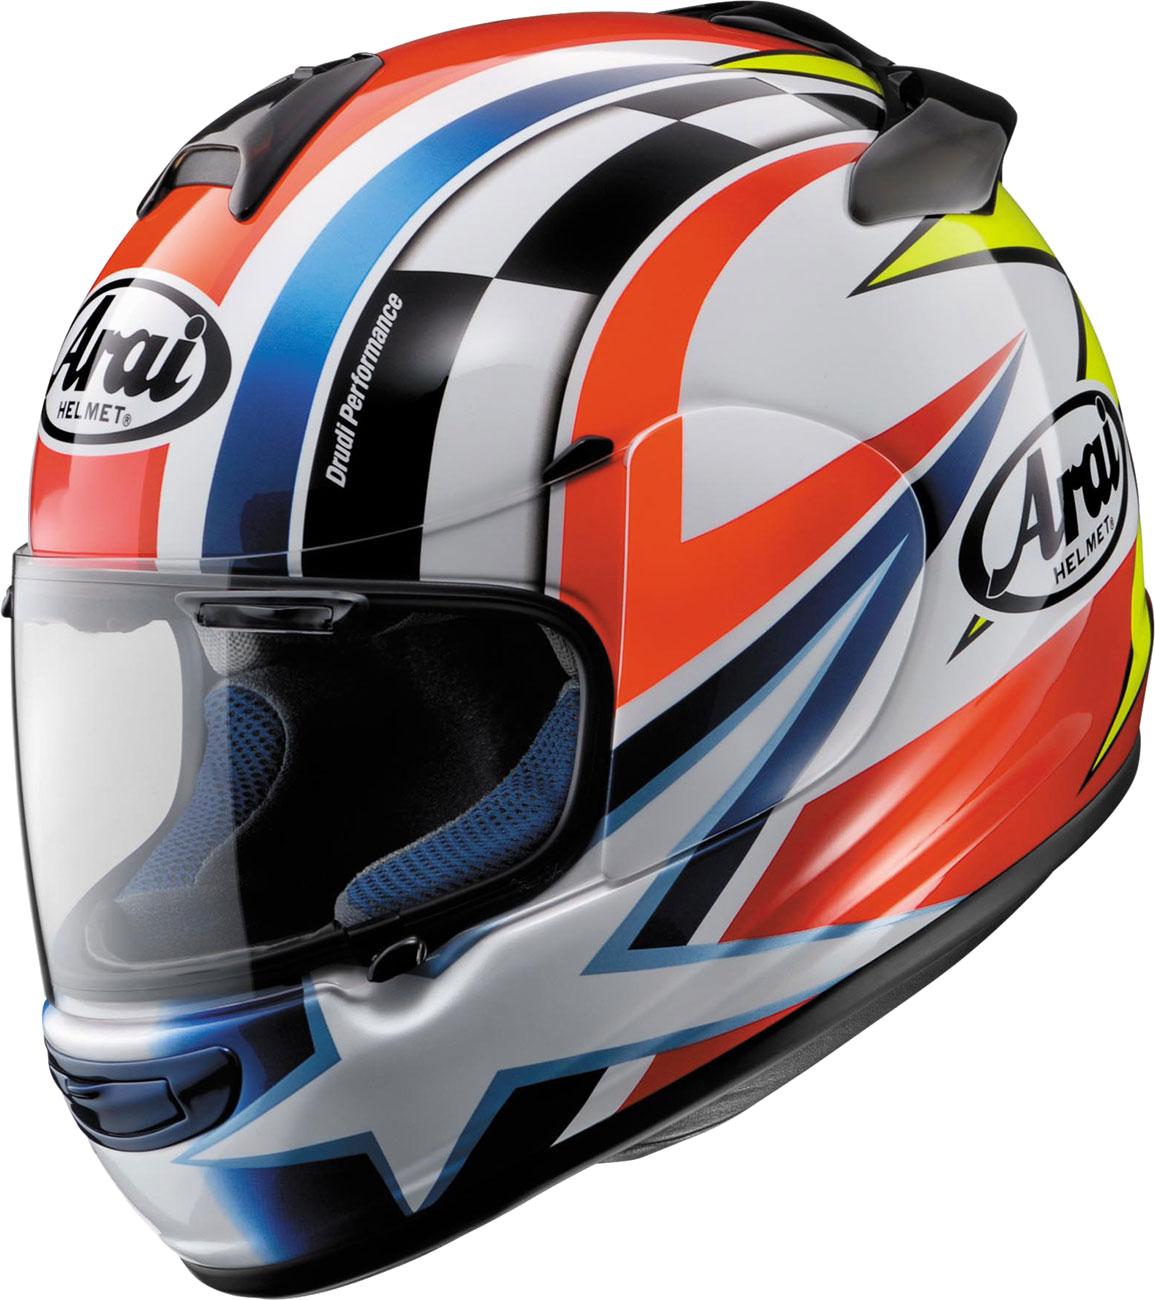 Motorcycle helmet png. Image purepng free transparent